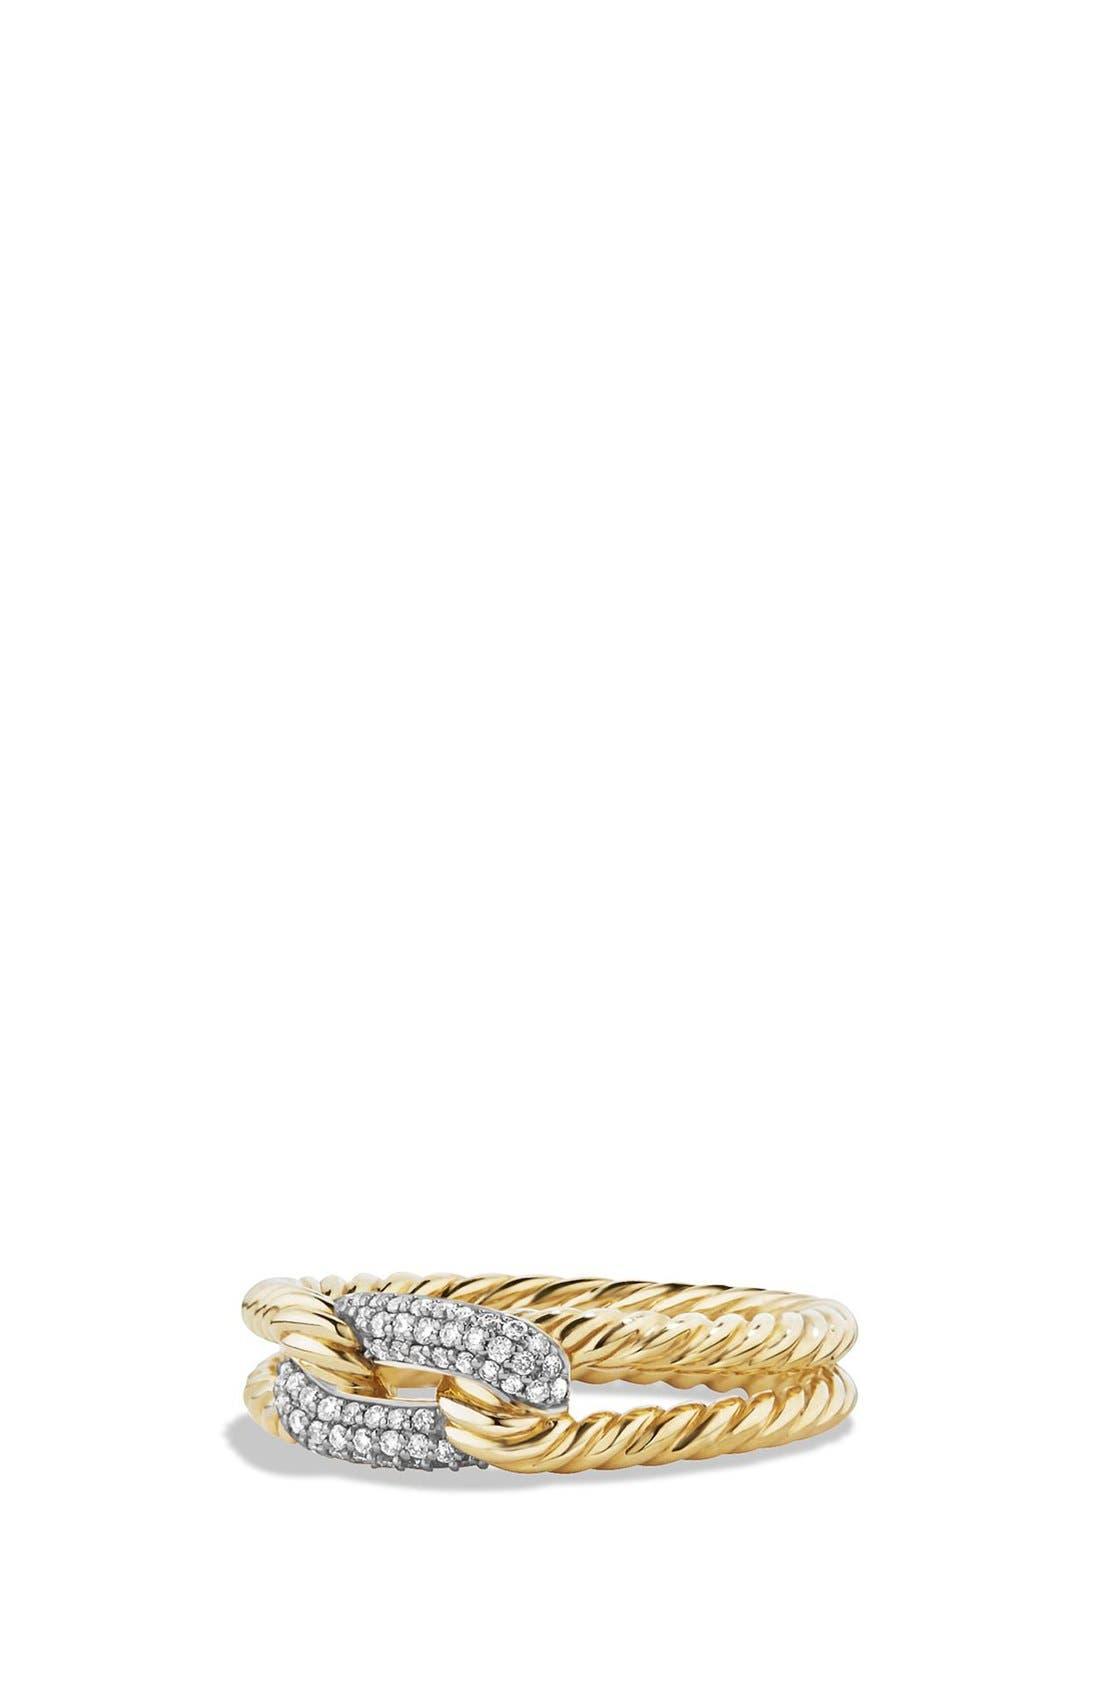 David Yurman 'Petite Pavé' Loop Ring with Diamonds in 18K Gold